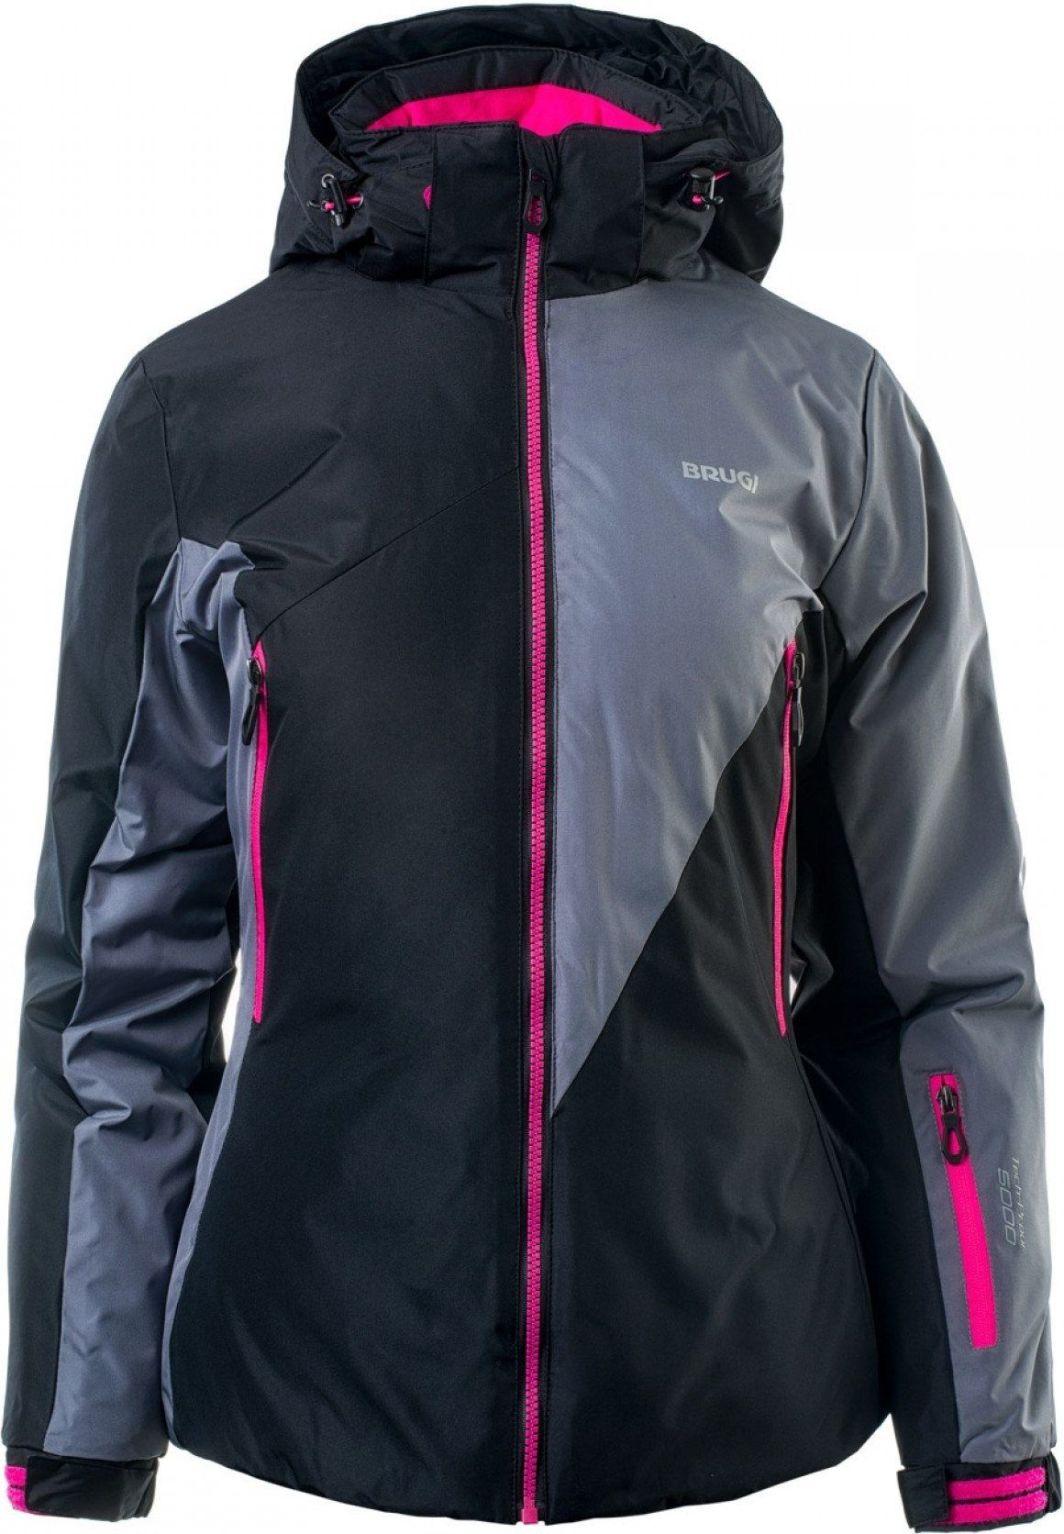 brugi kurtka narciarska czarna damska